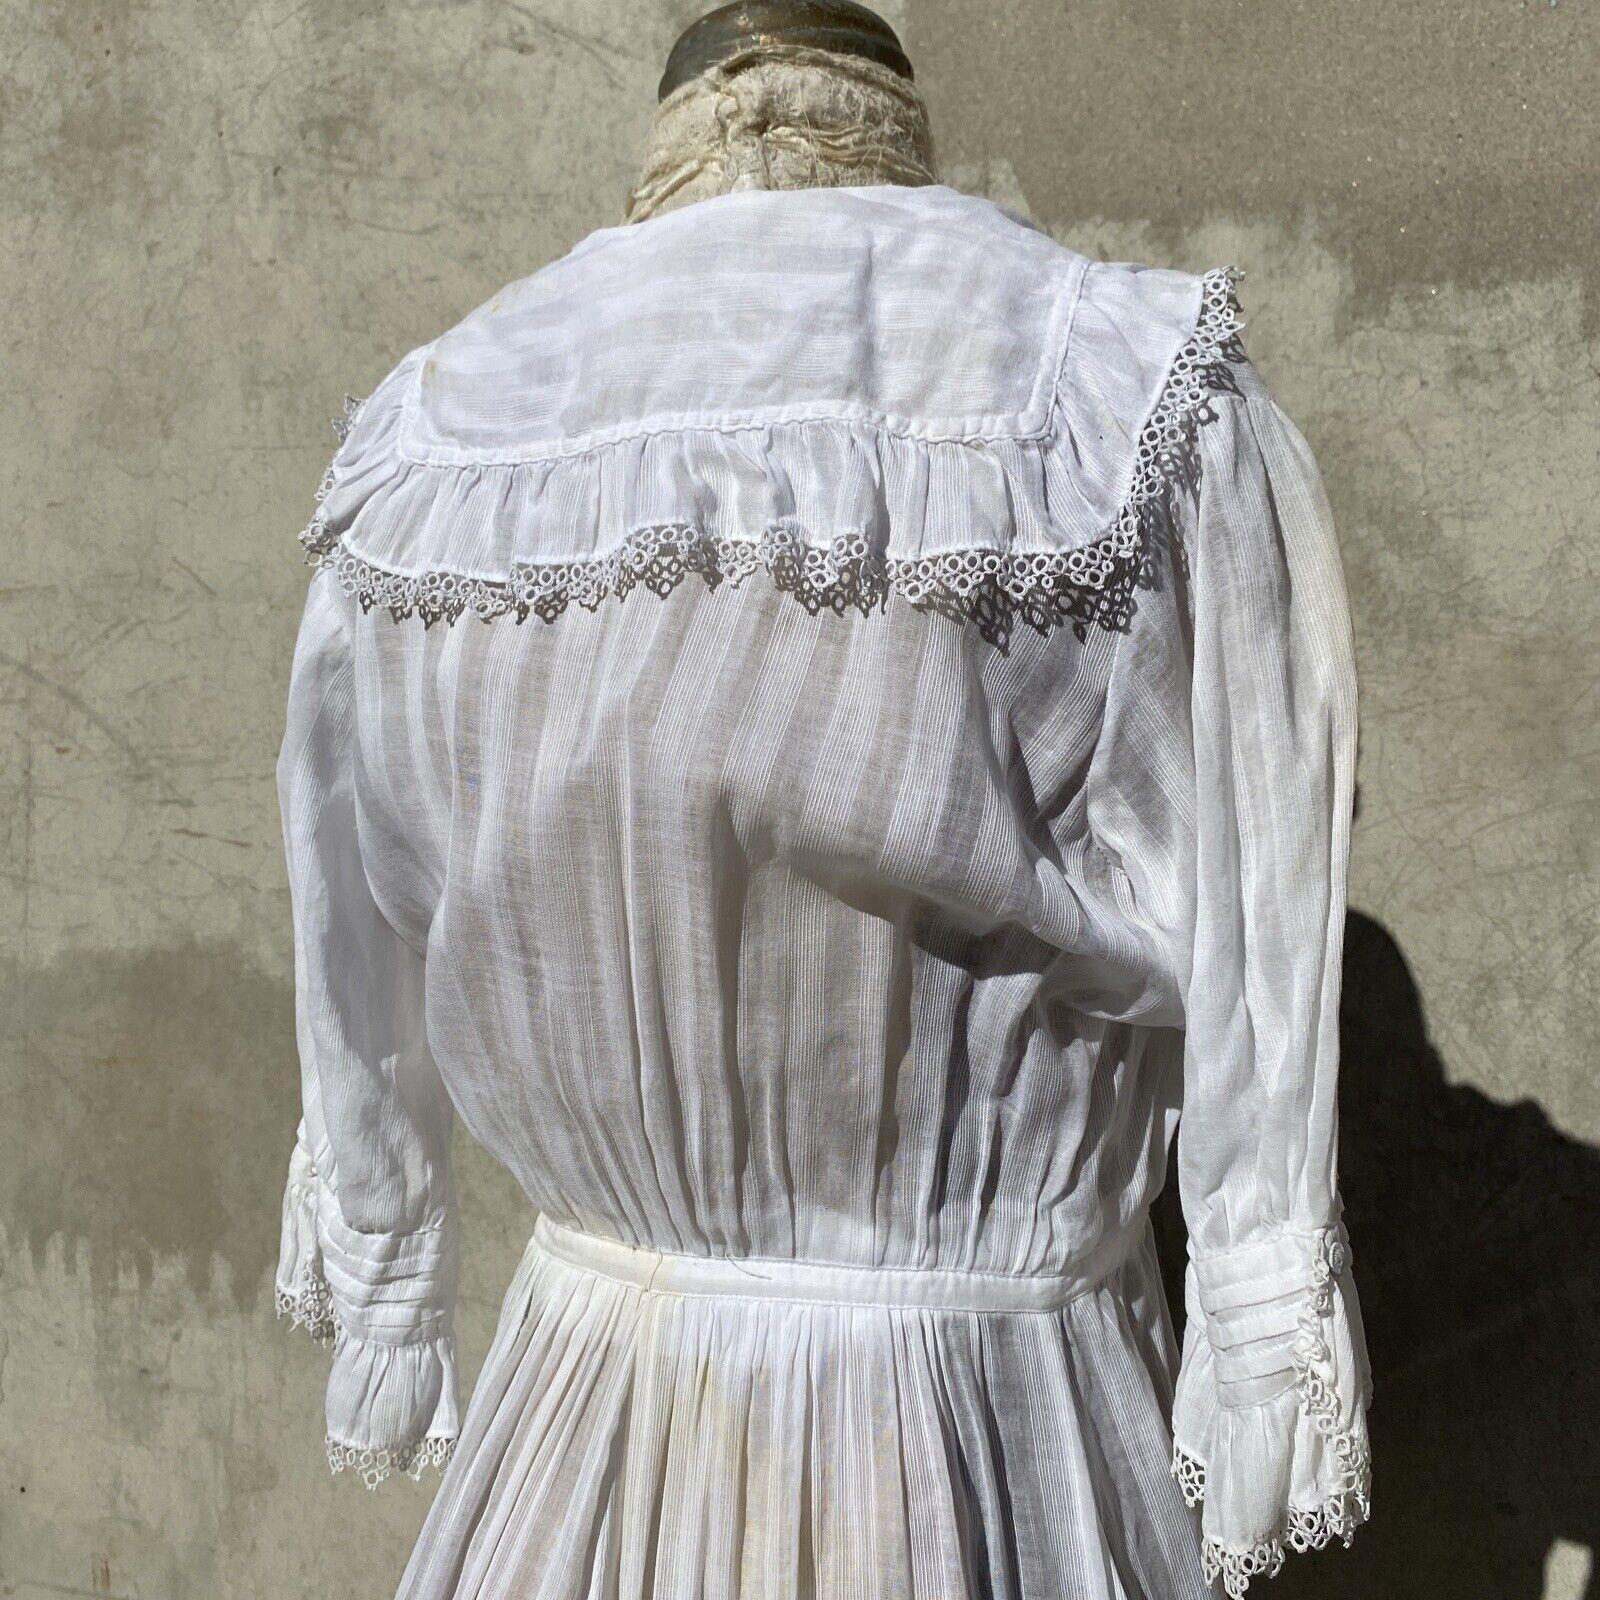 Antique Edwardian White Cotton Tea Dress Maxi Lac… - image 11